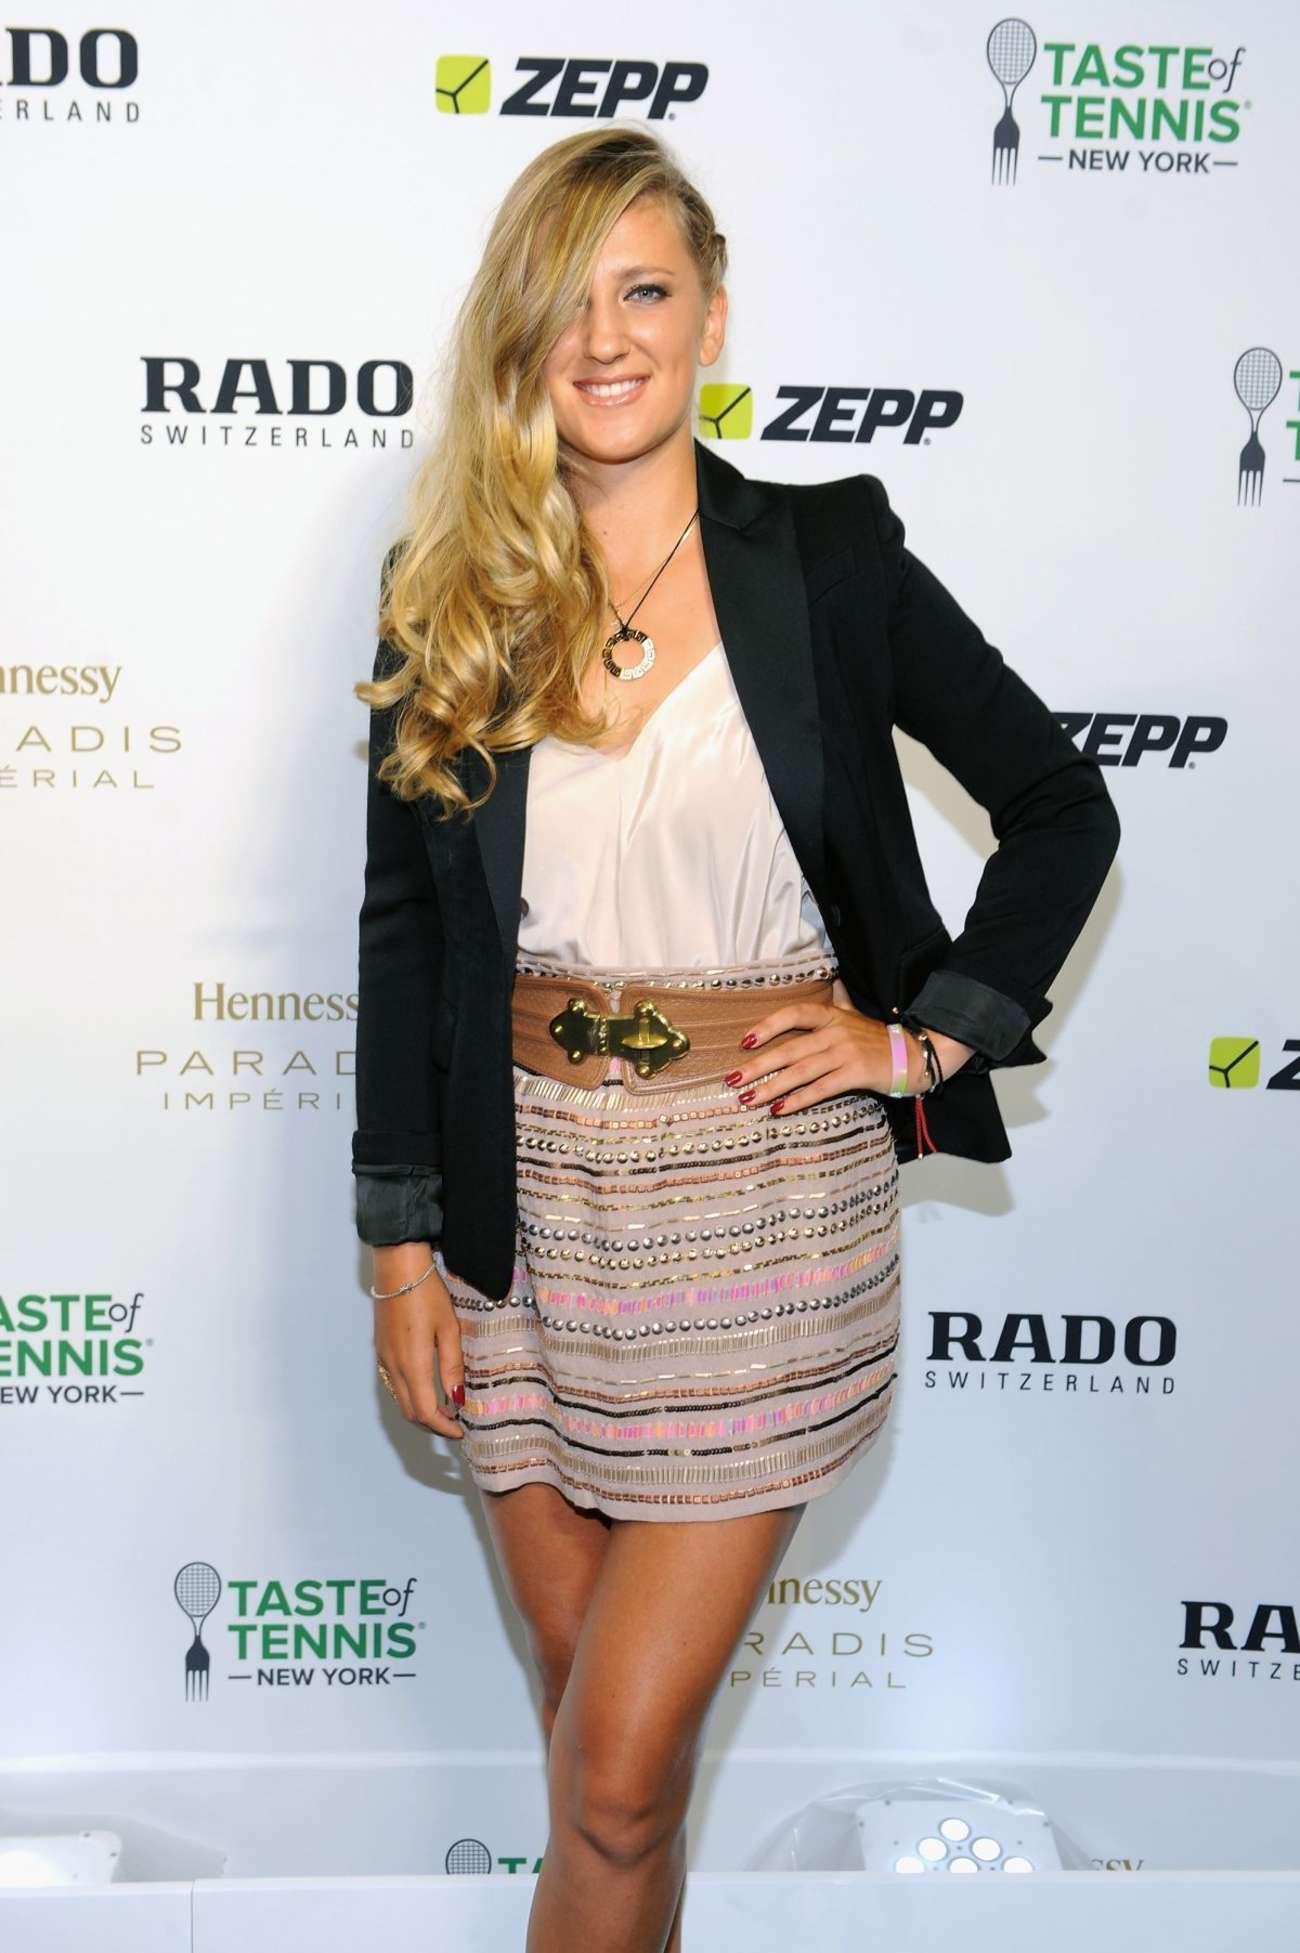 Victoria Azarenka Taste of Tennis Gala in New York